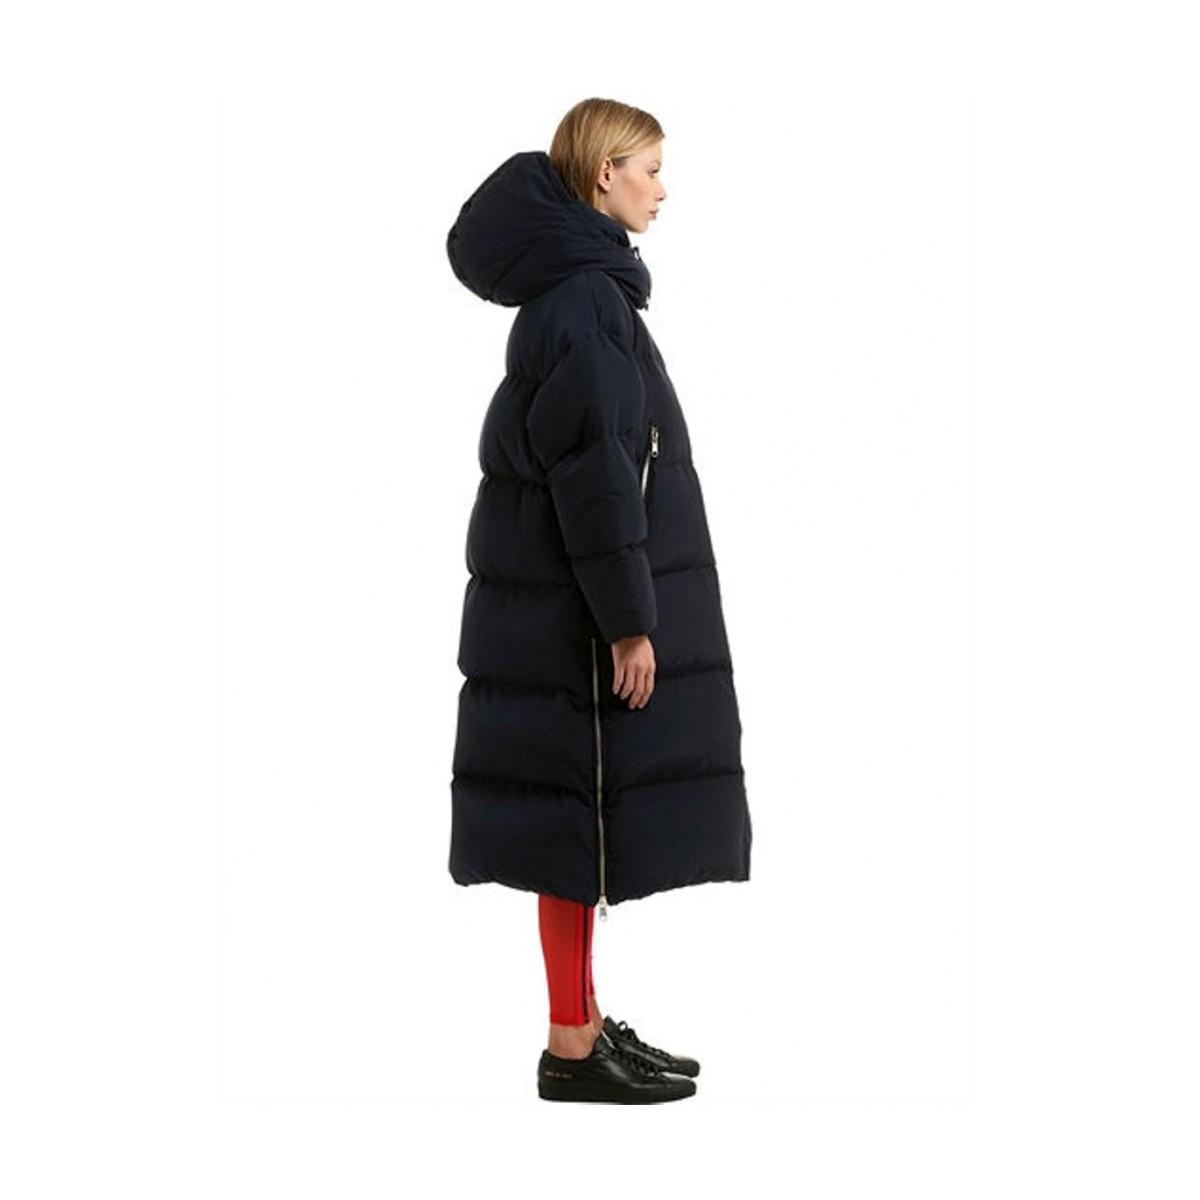 7f1686cc0 GIGI HADID X TOMMY HIFLIGER collection long puffer coat